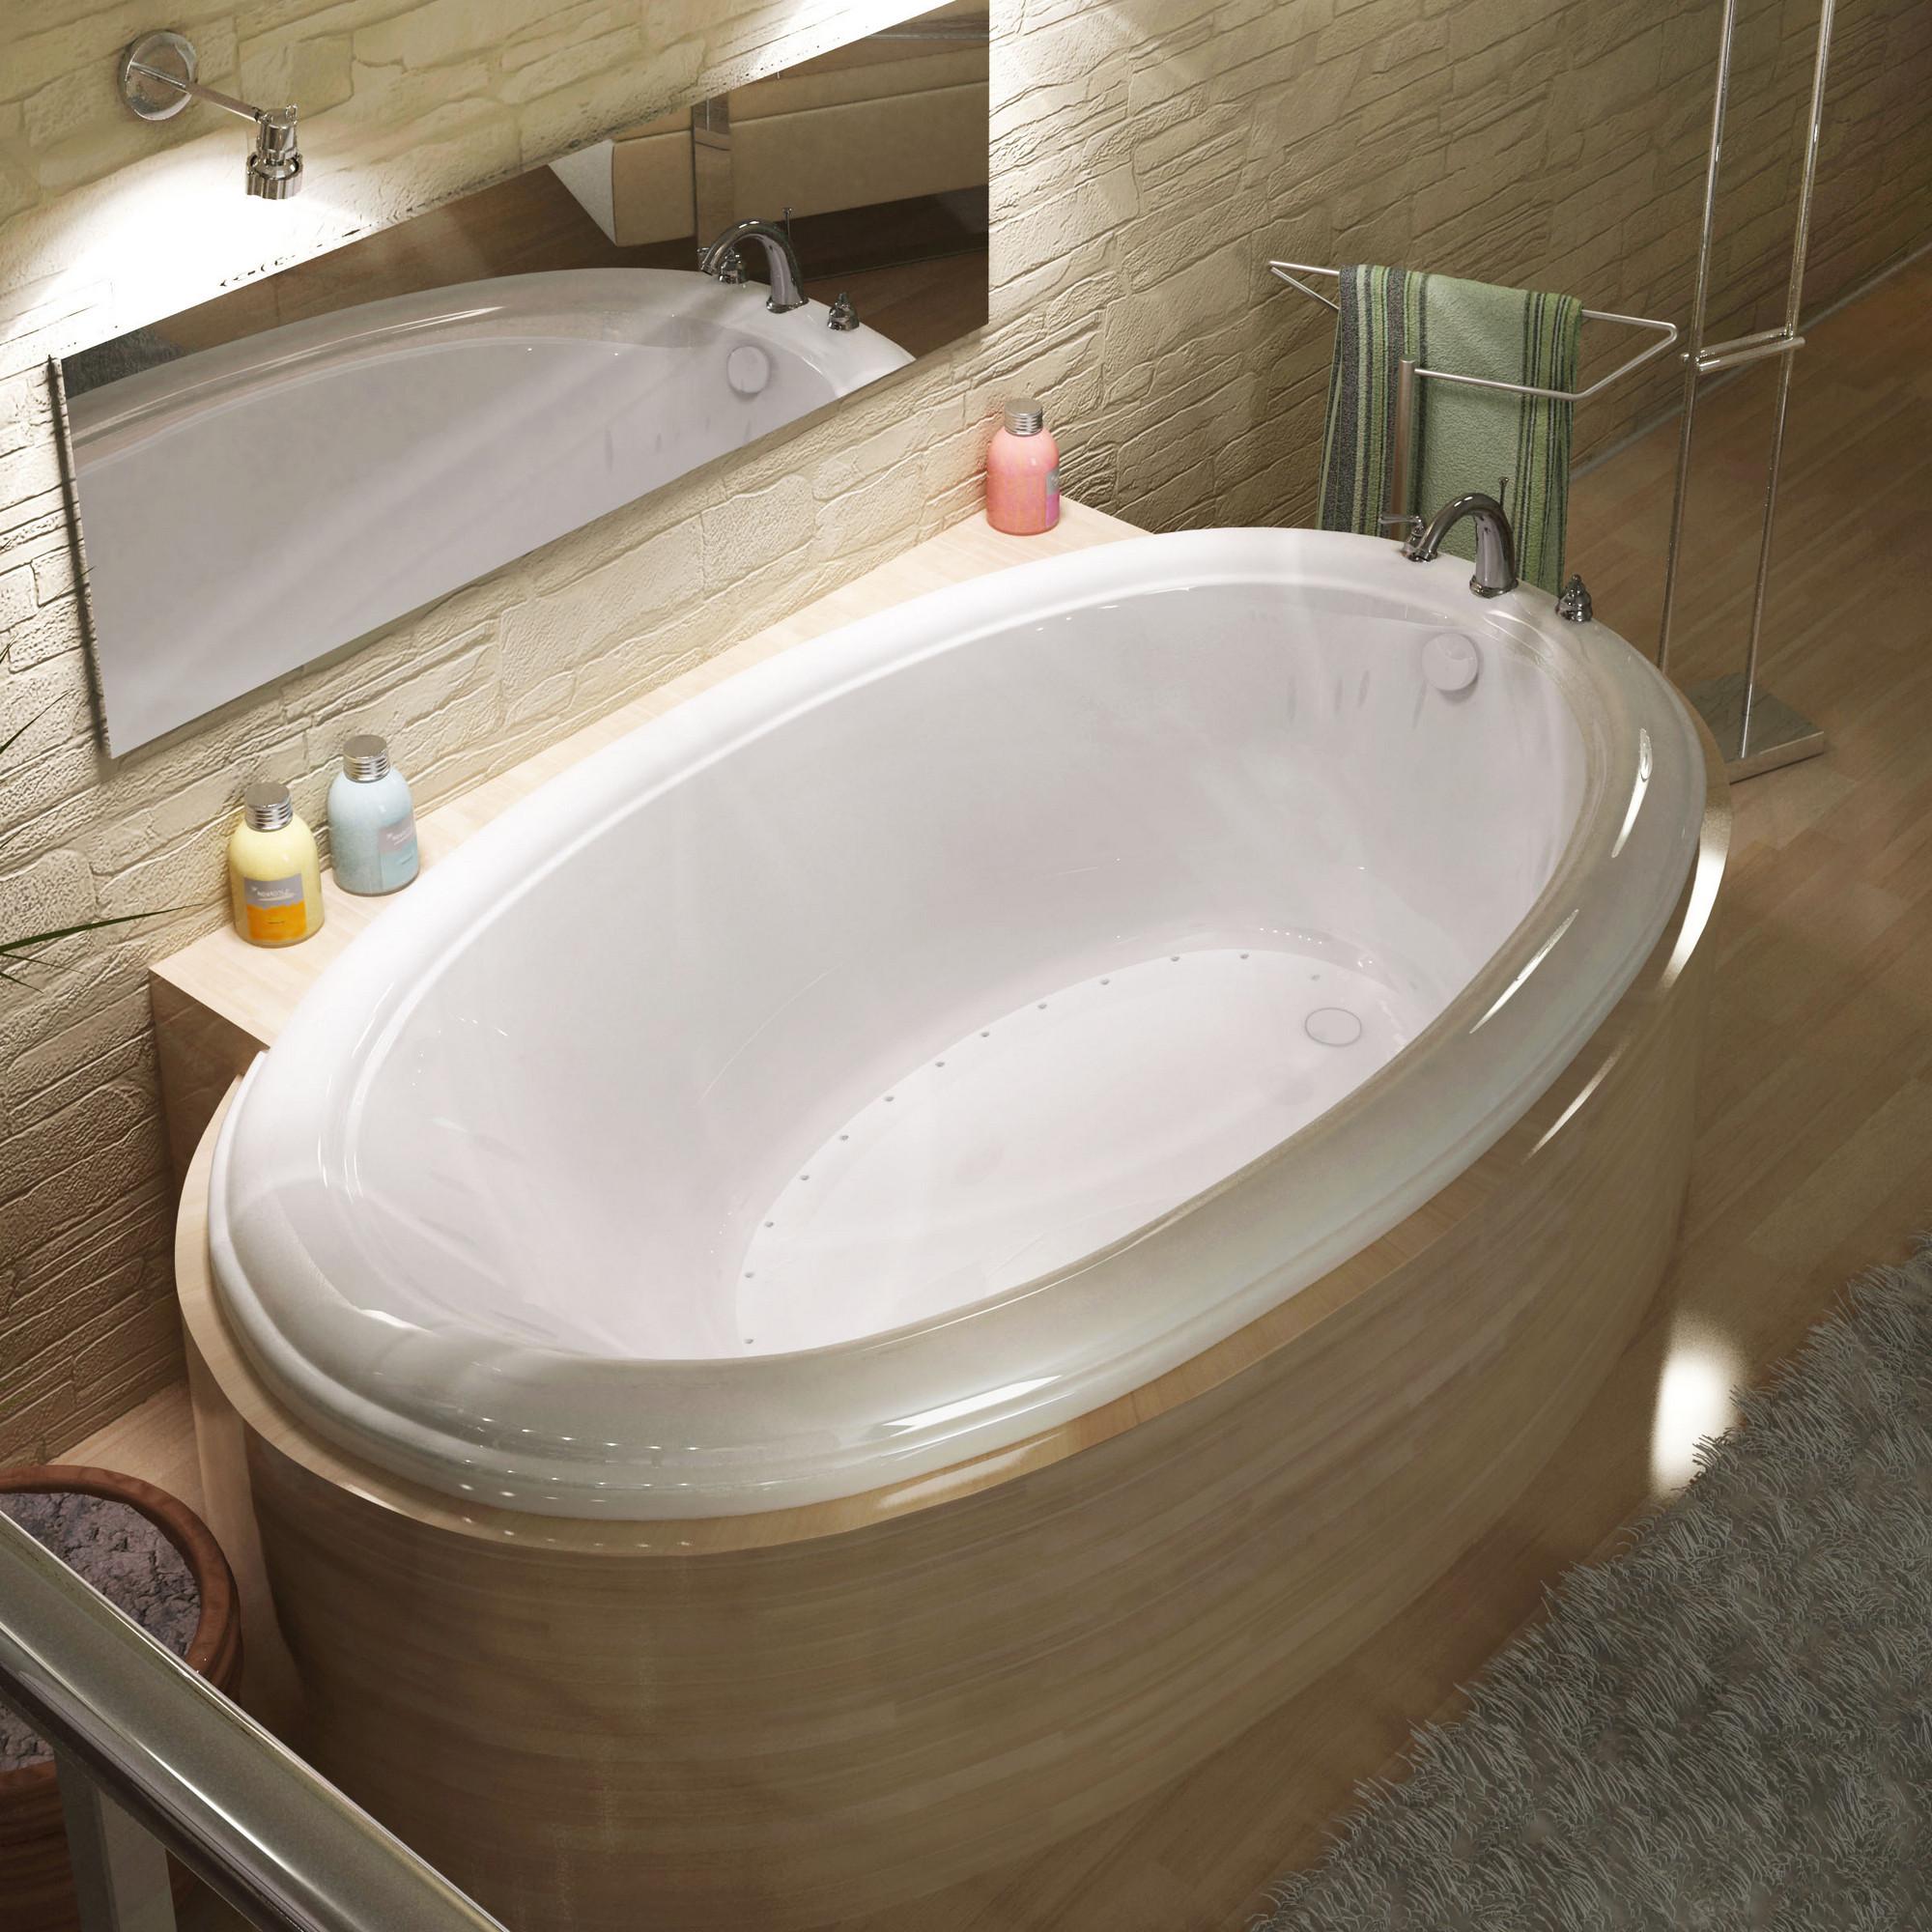 MediTub 3660PAL Atlantis Petite Oval Air Jetted Bathtub With Left Drain